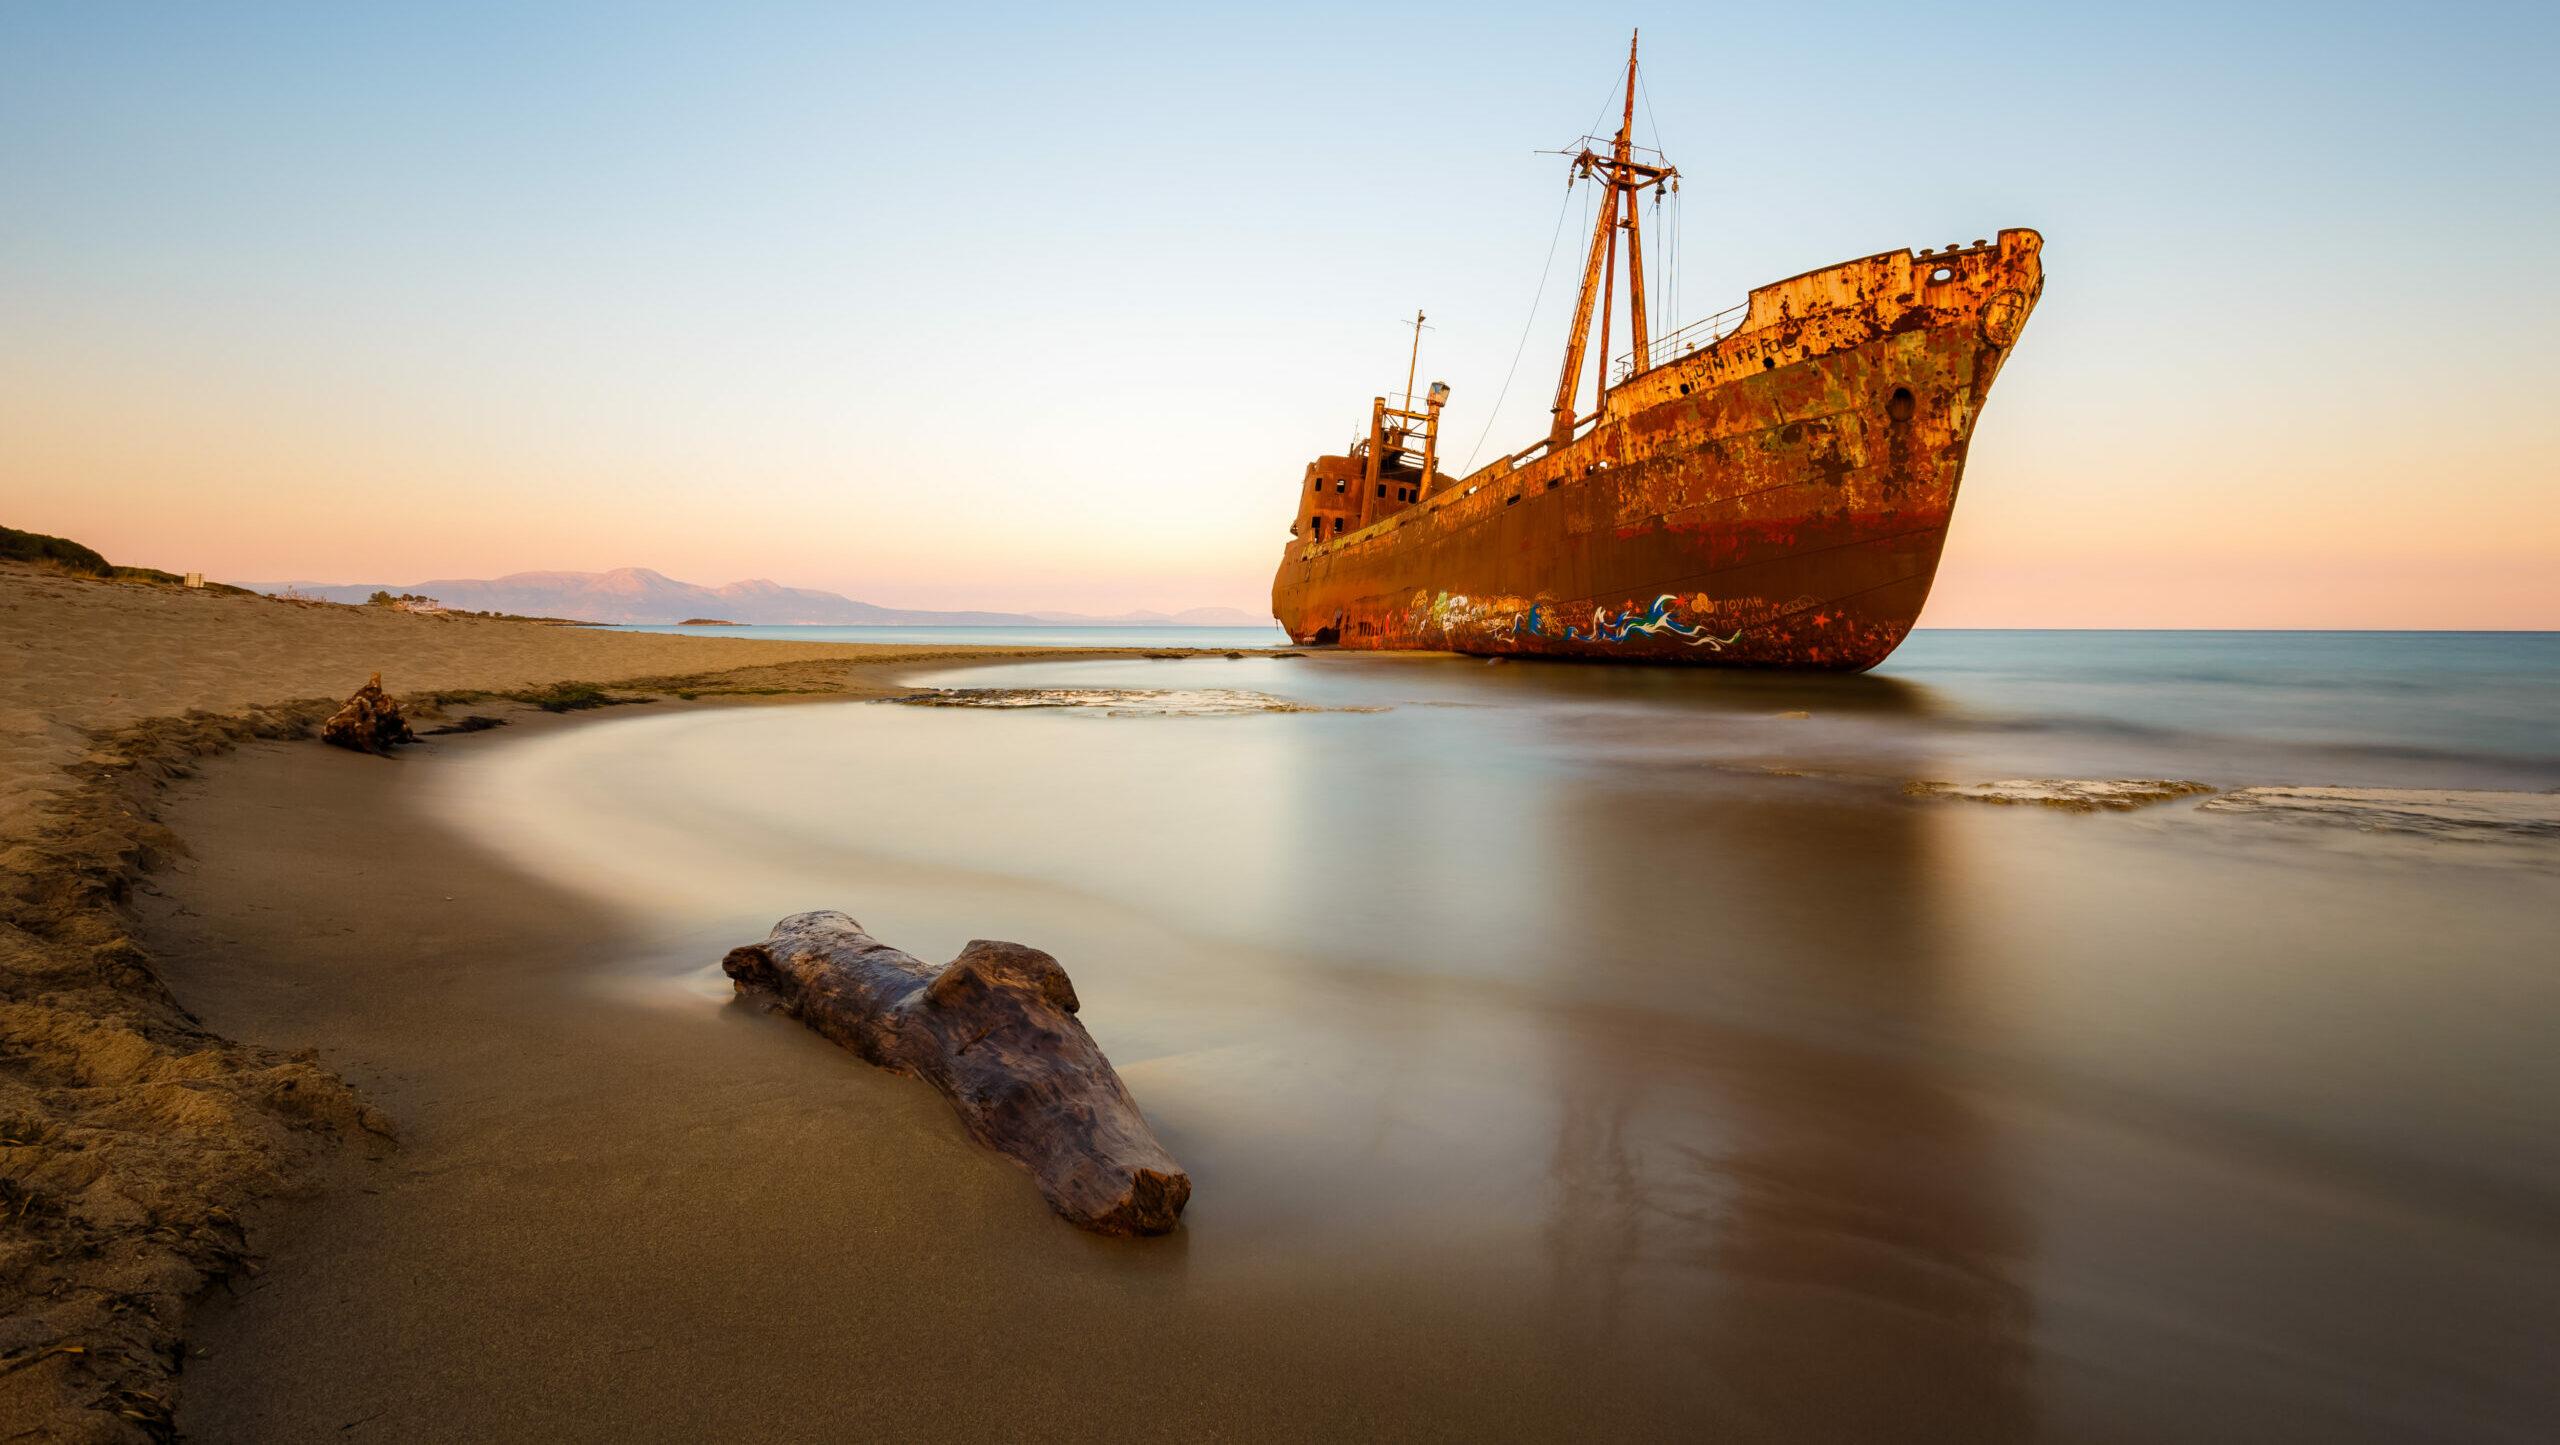 Gythio: Shipwreck Dimitrios, the ghost ship that enchants you